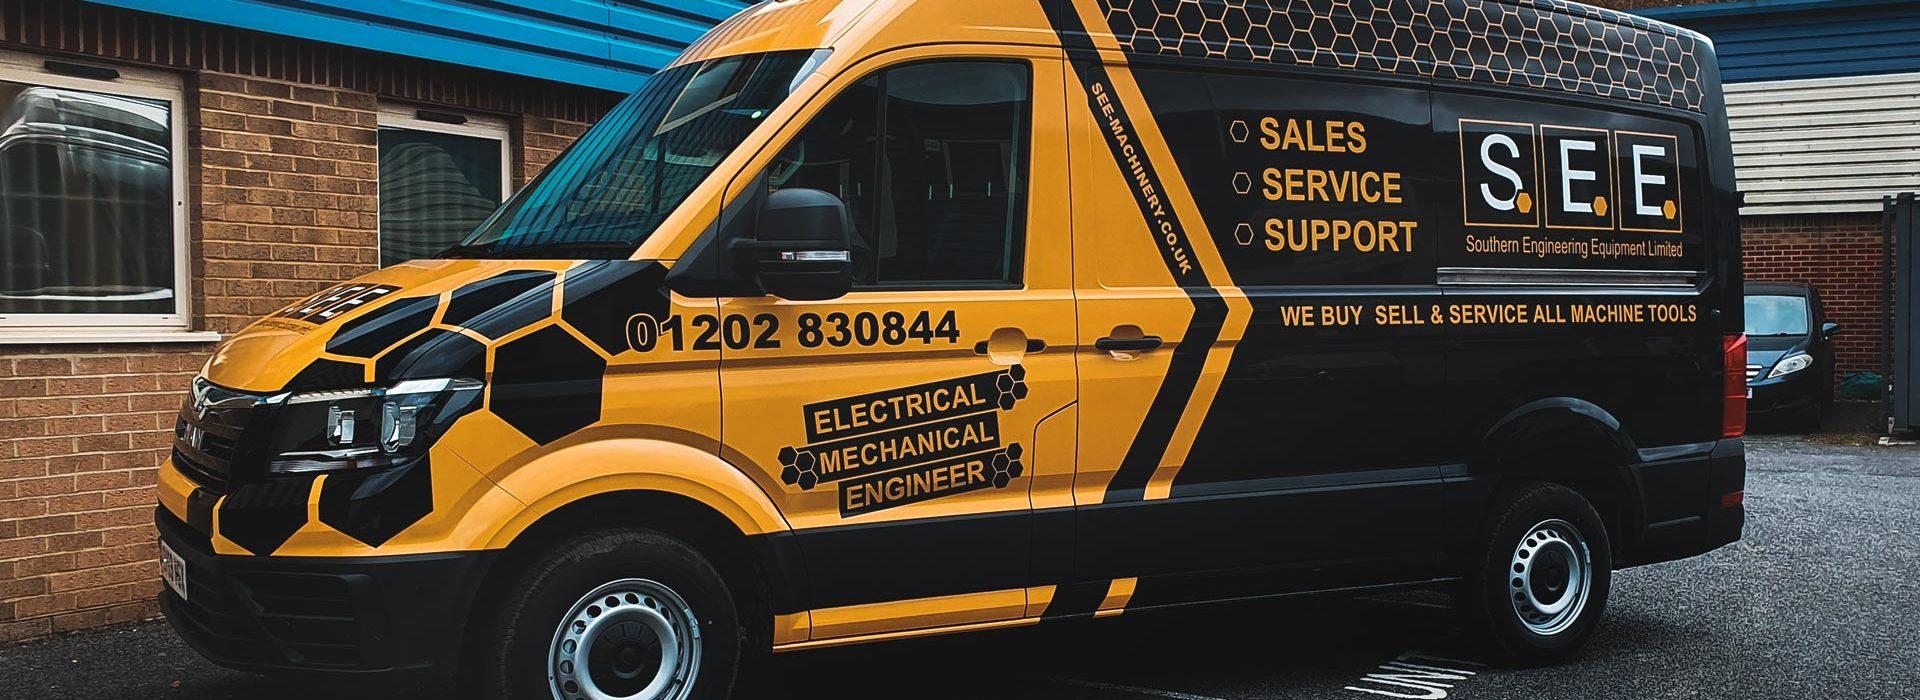 Portfolio - Southern Engineering Equipment Ltd Van Wrap - Insignia Signs